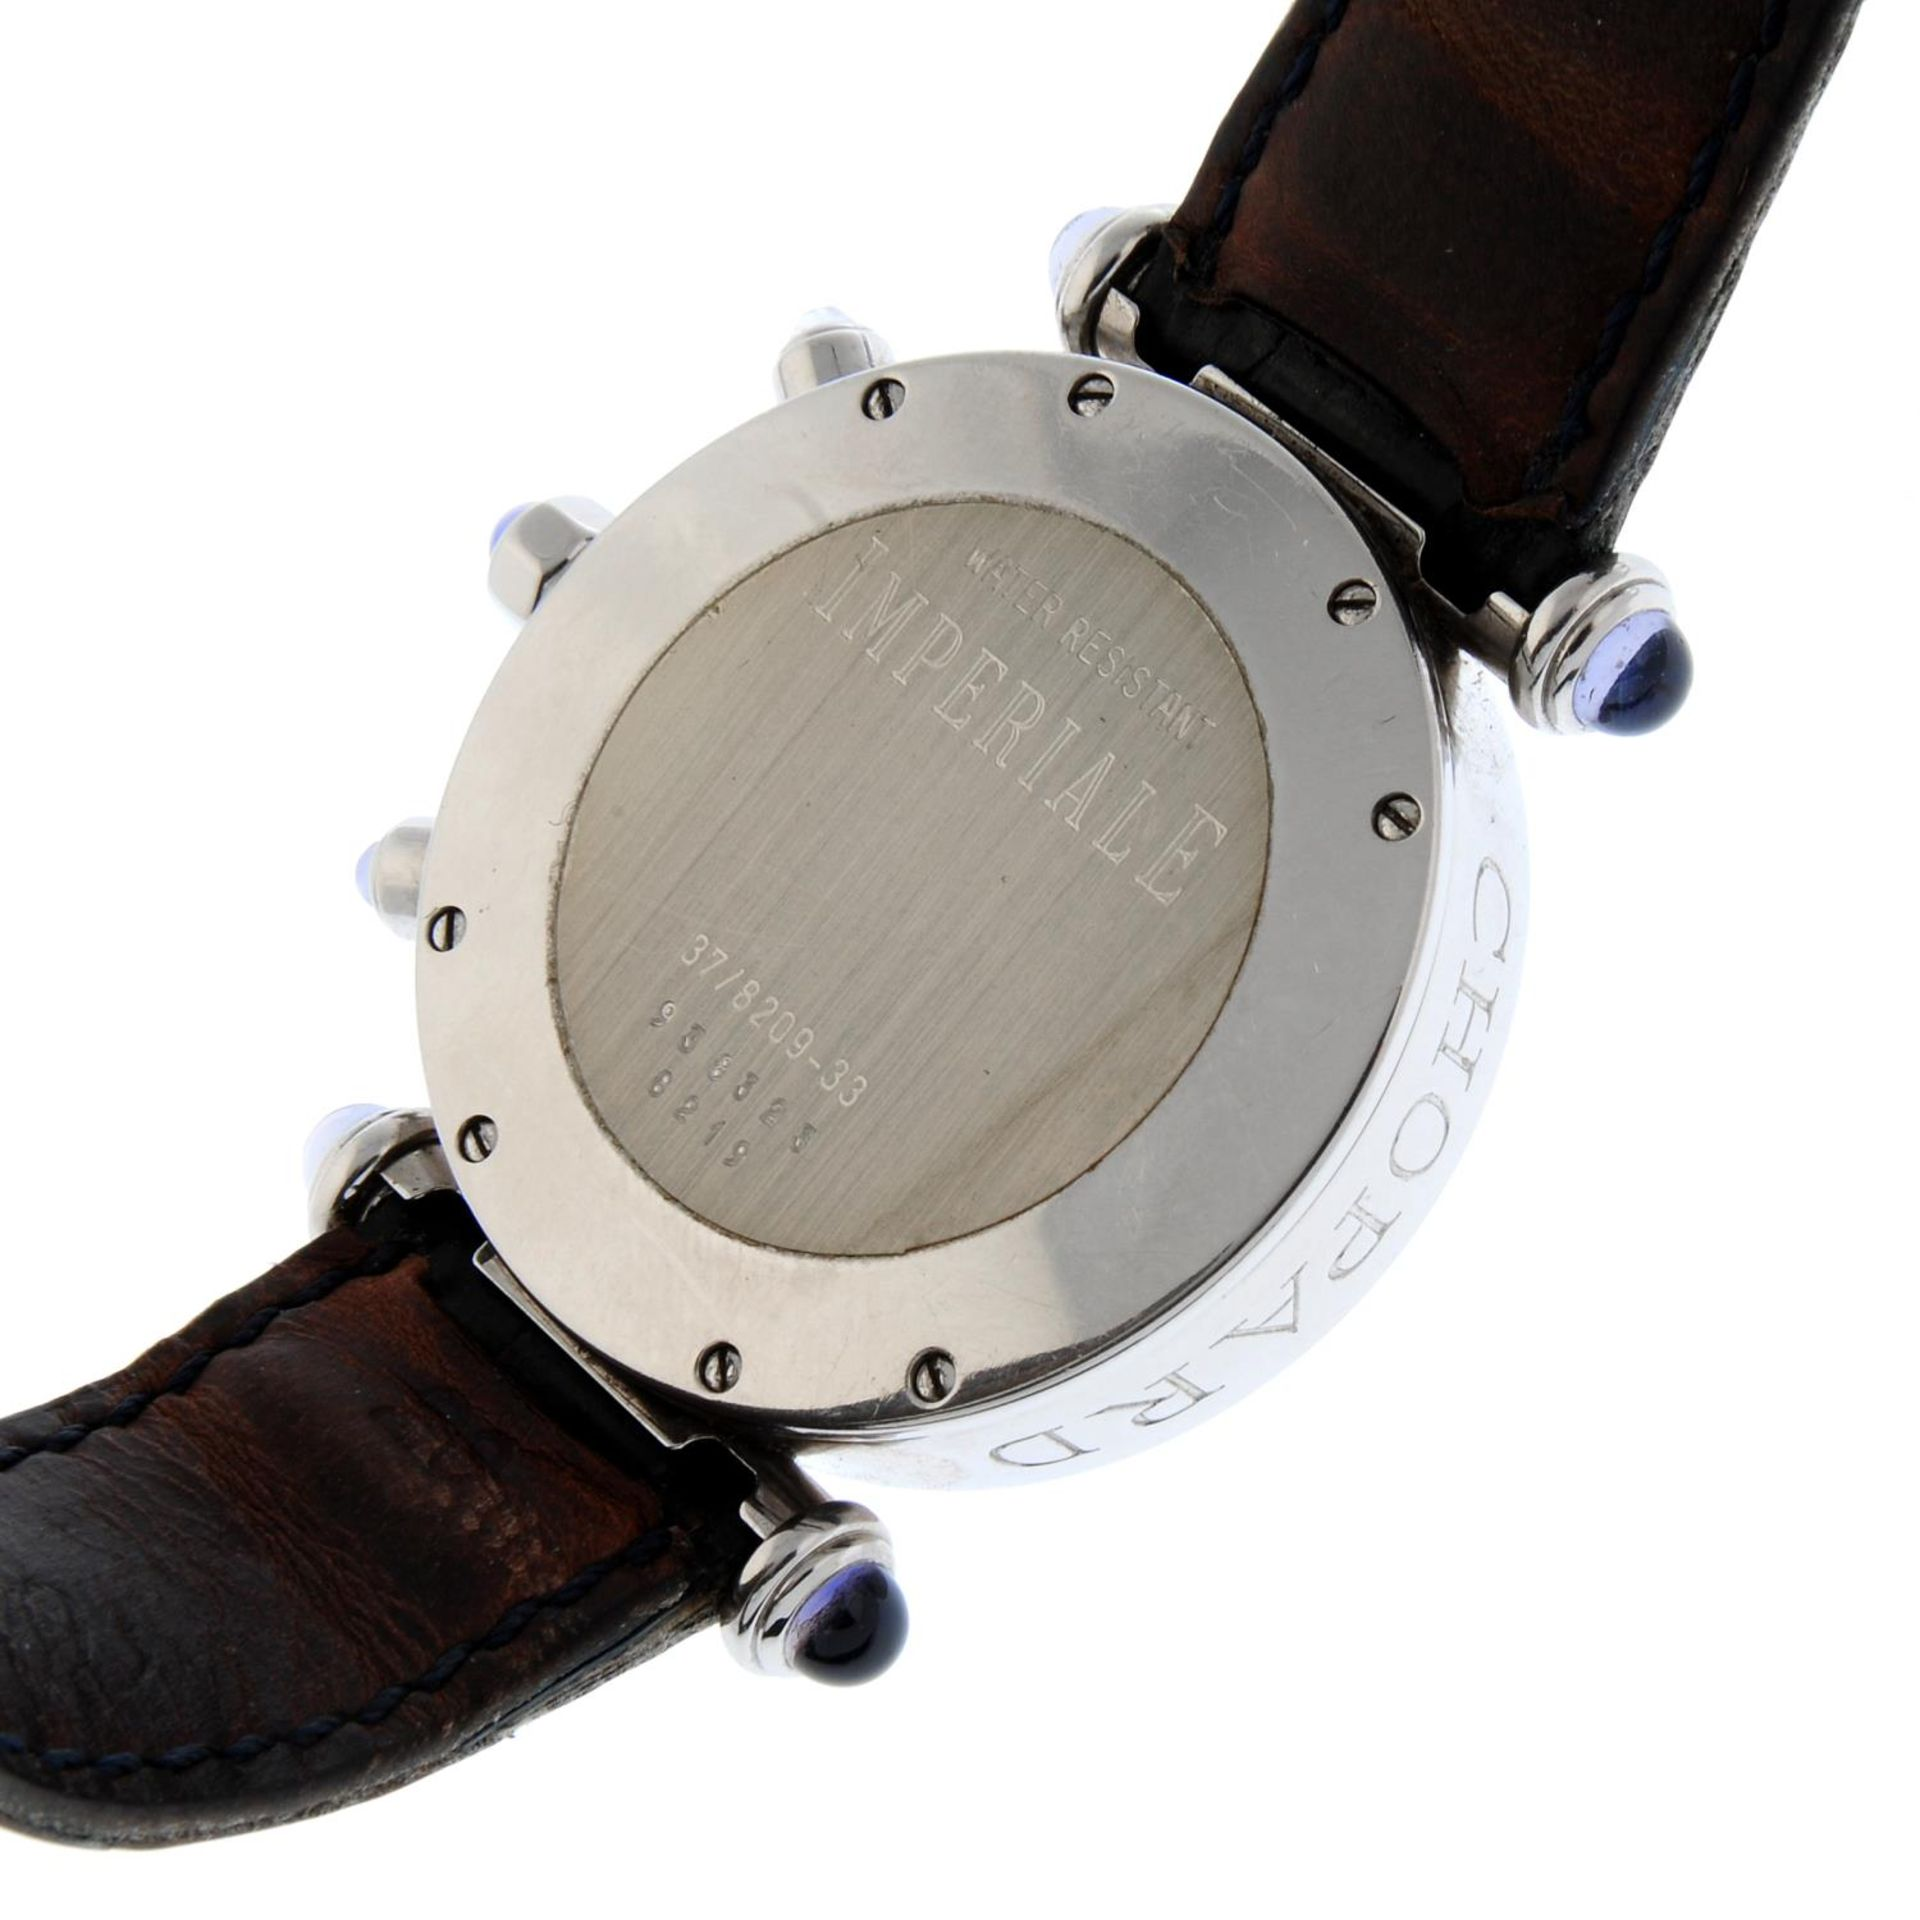 CHOPARD - an Imperiale chronograph wrist watch. - Bild 5 aus 5